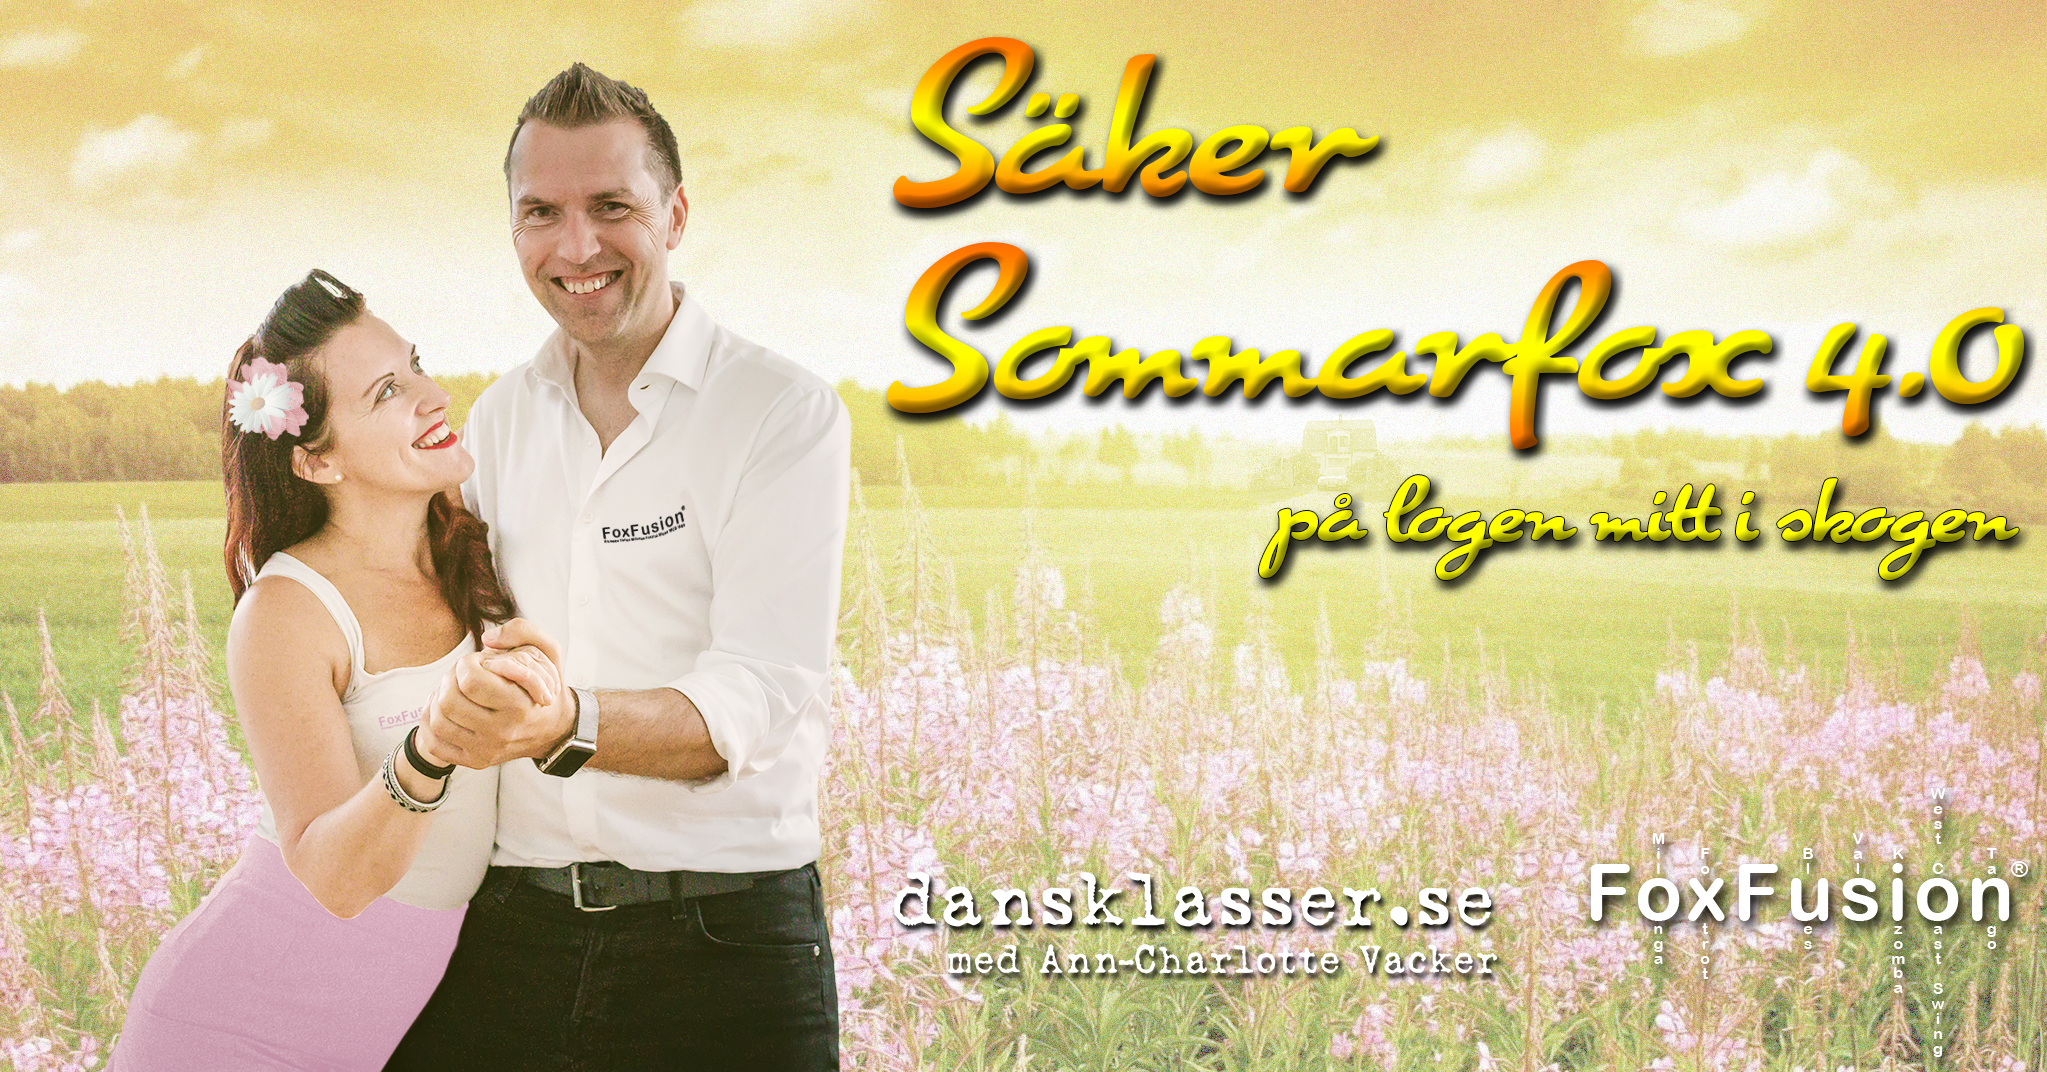 Sommarfox 4.0